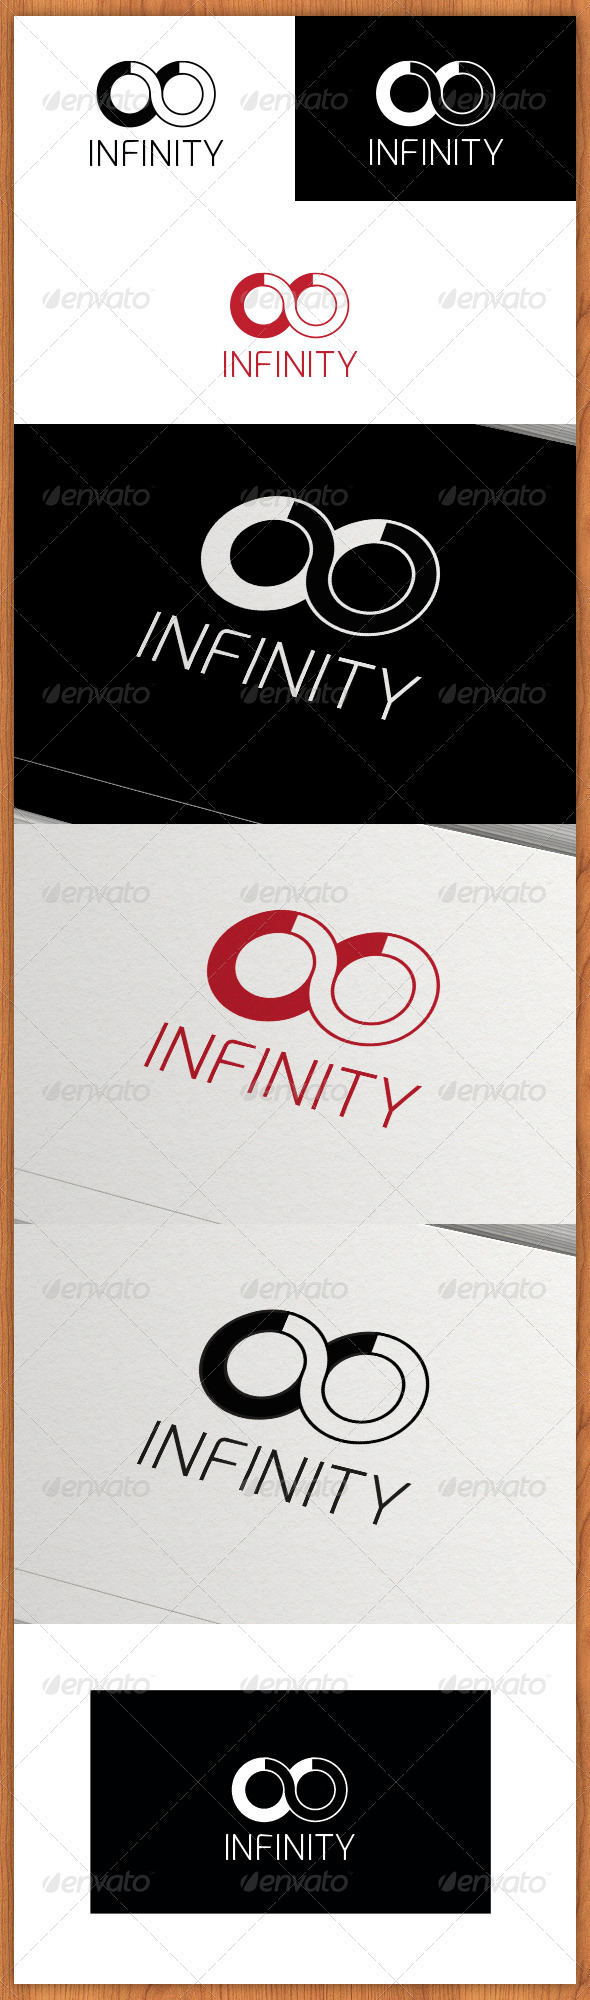 GraphicRiver Infiniti Logotype 3916318